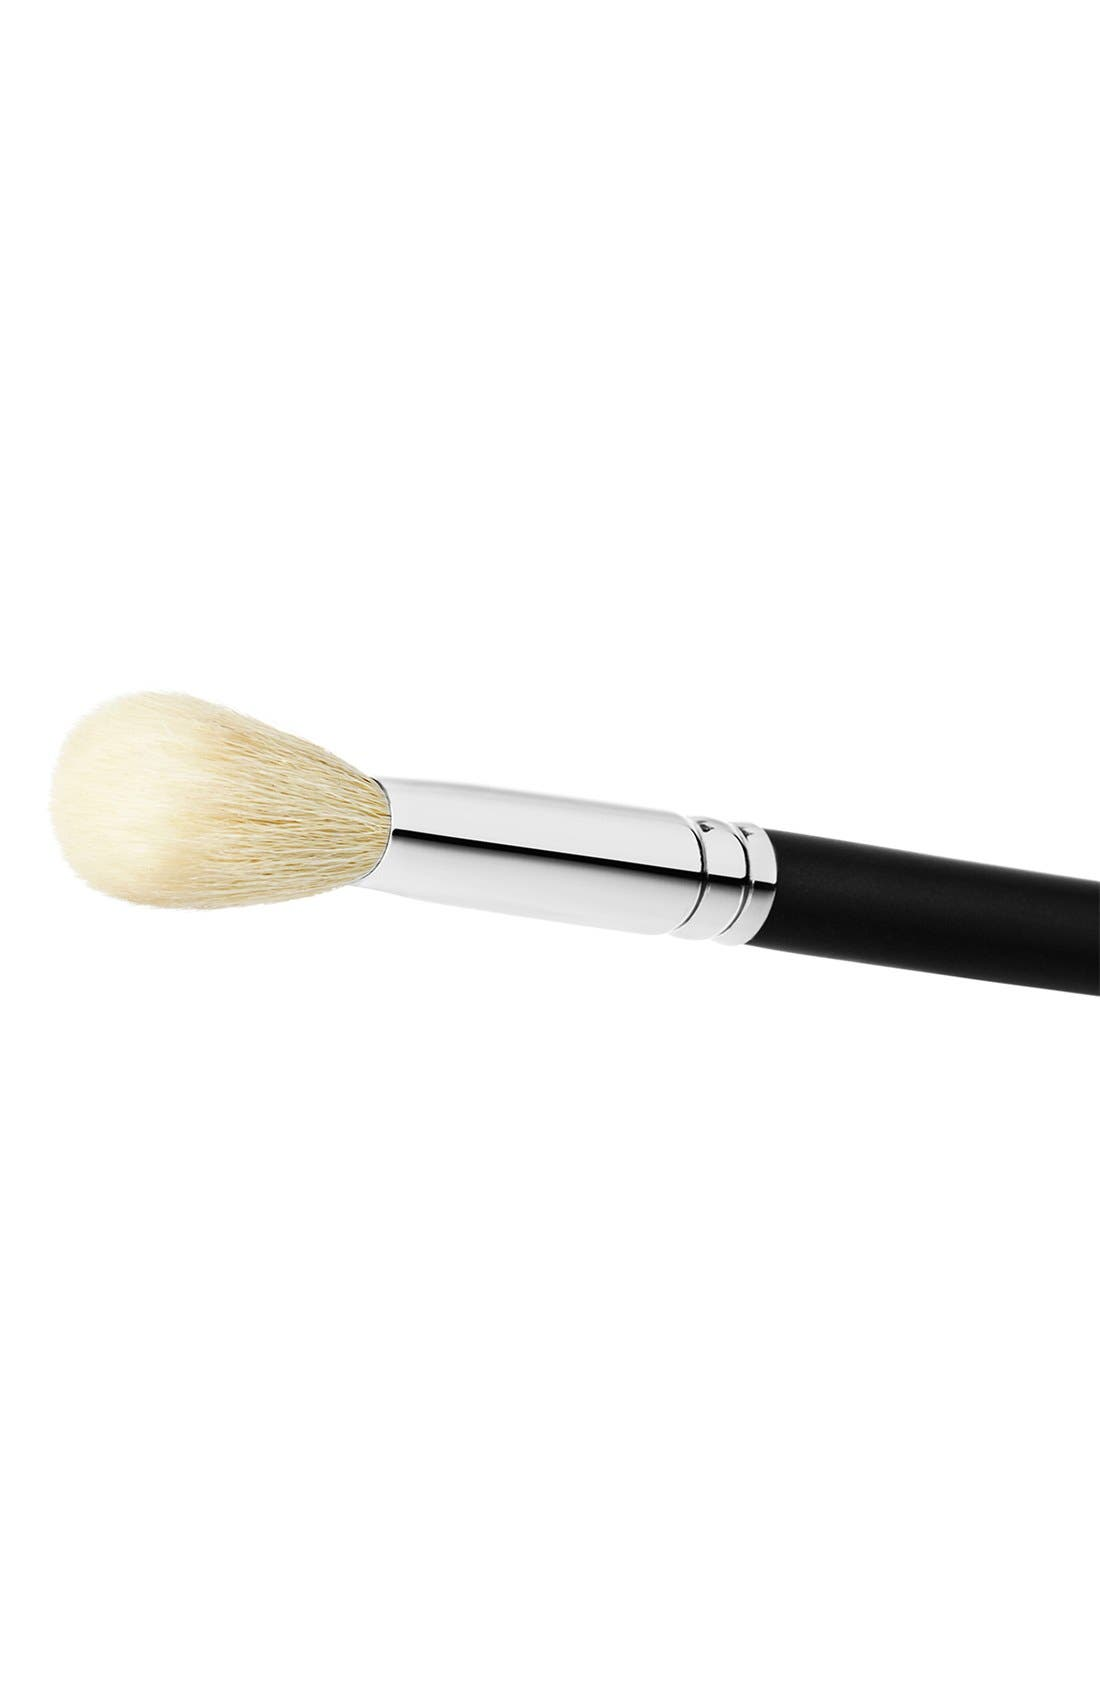 MAC 168 Large Angled Contour Brush,                             Alternate thumbnail 5, color,                             000